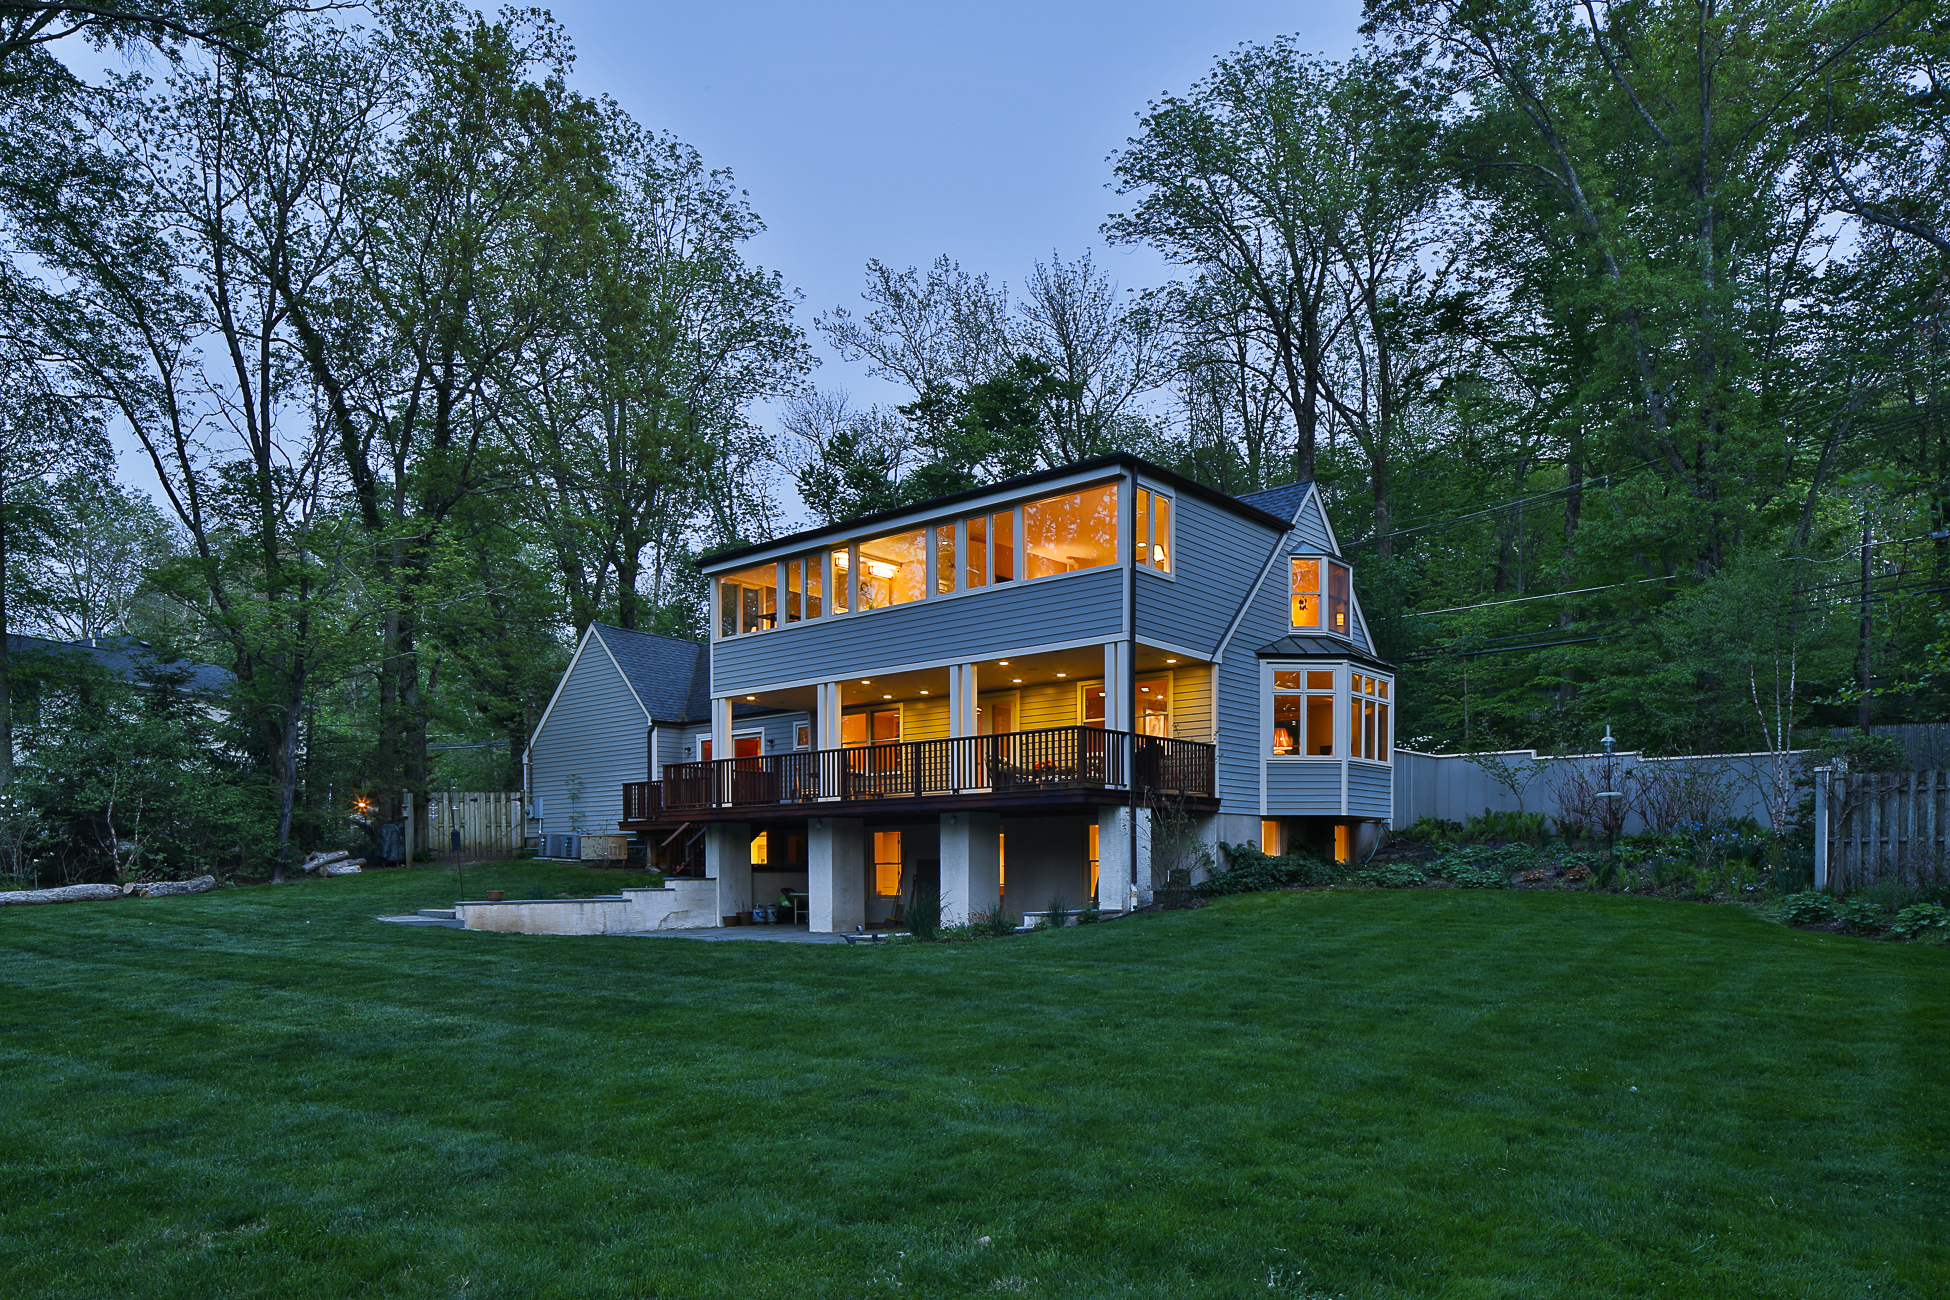 Maison unifamiliale pour l Vente à Thoughtfully Renovated Home In Parklike Setting 81 Pretty Brook Road Princeton, New Jersey 08540 États-Unis